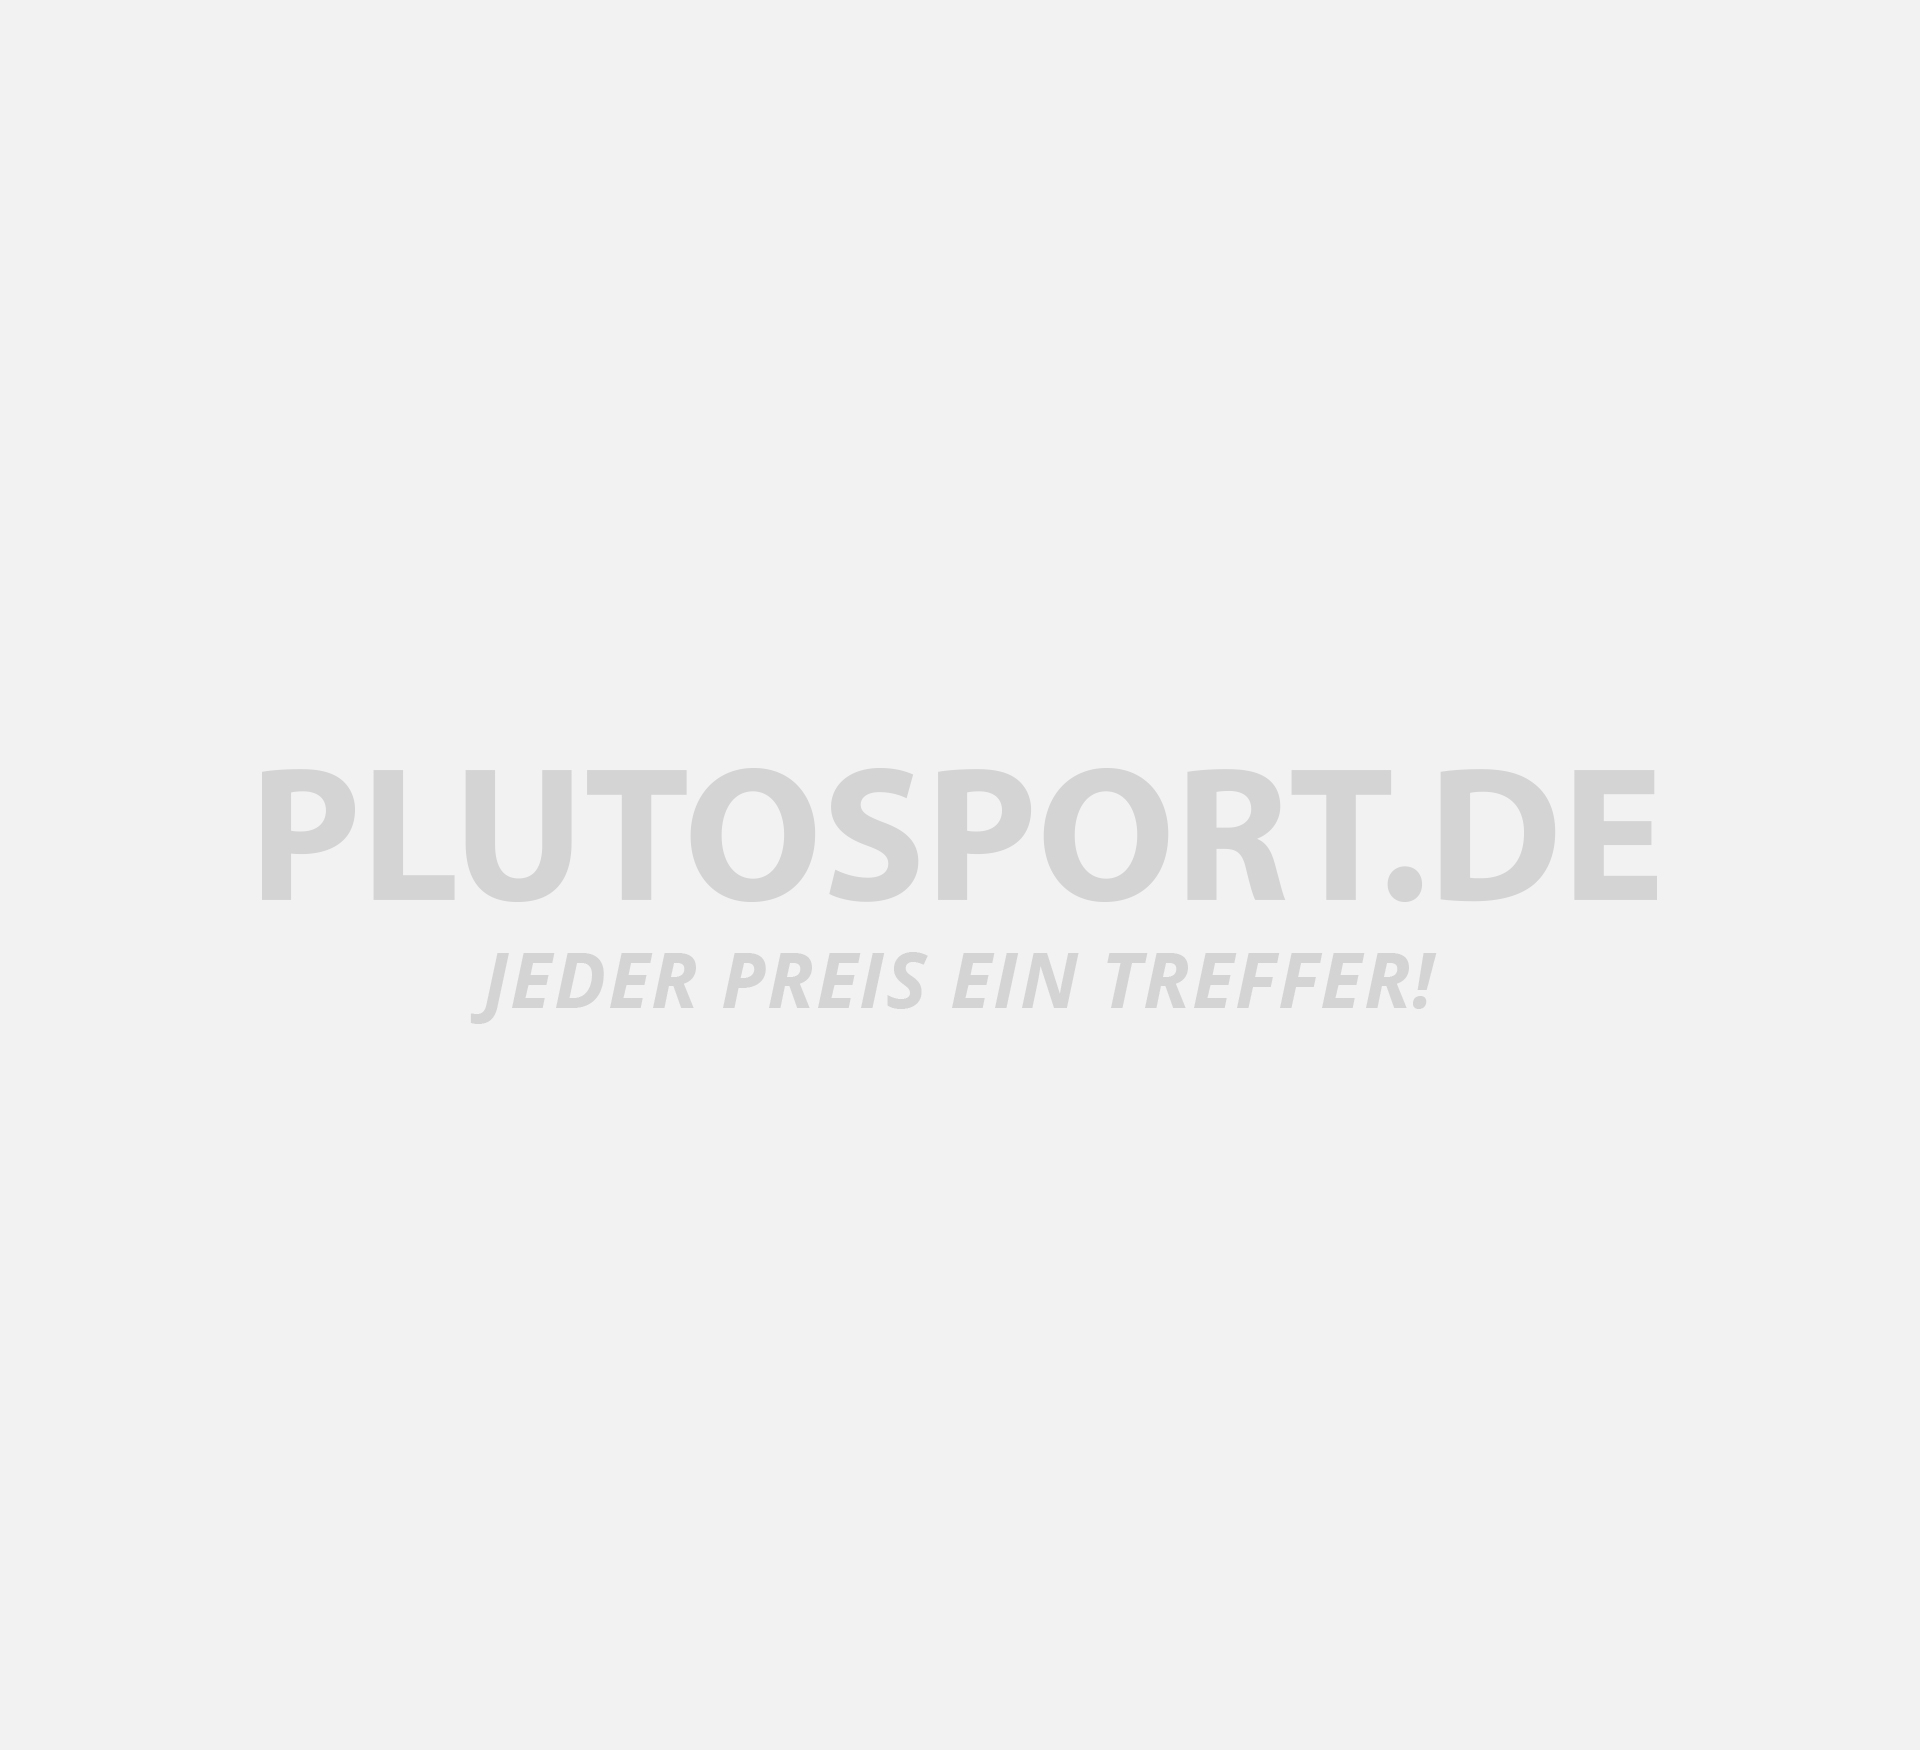 new product d4837 7310f Nike Air Max Axis - Sneakers - Schuhe - Freizeit - Herren  P